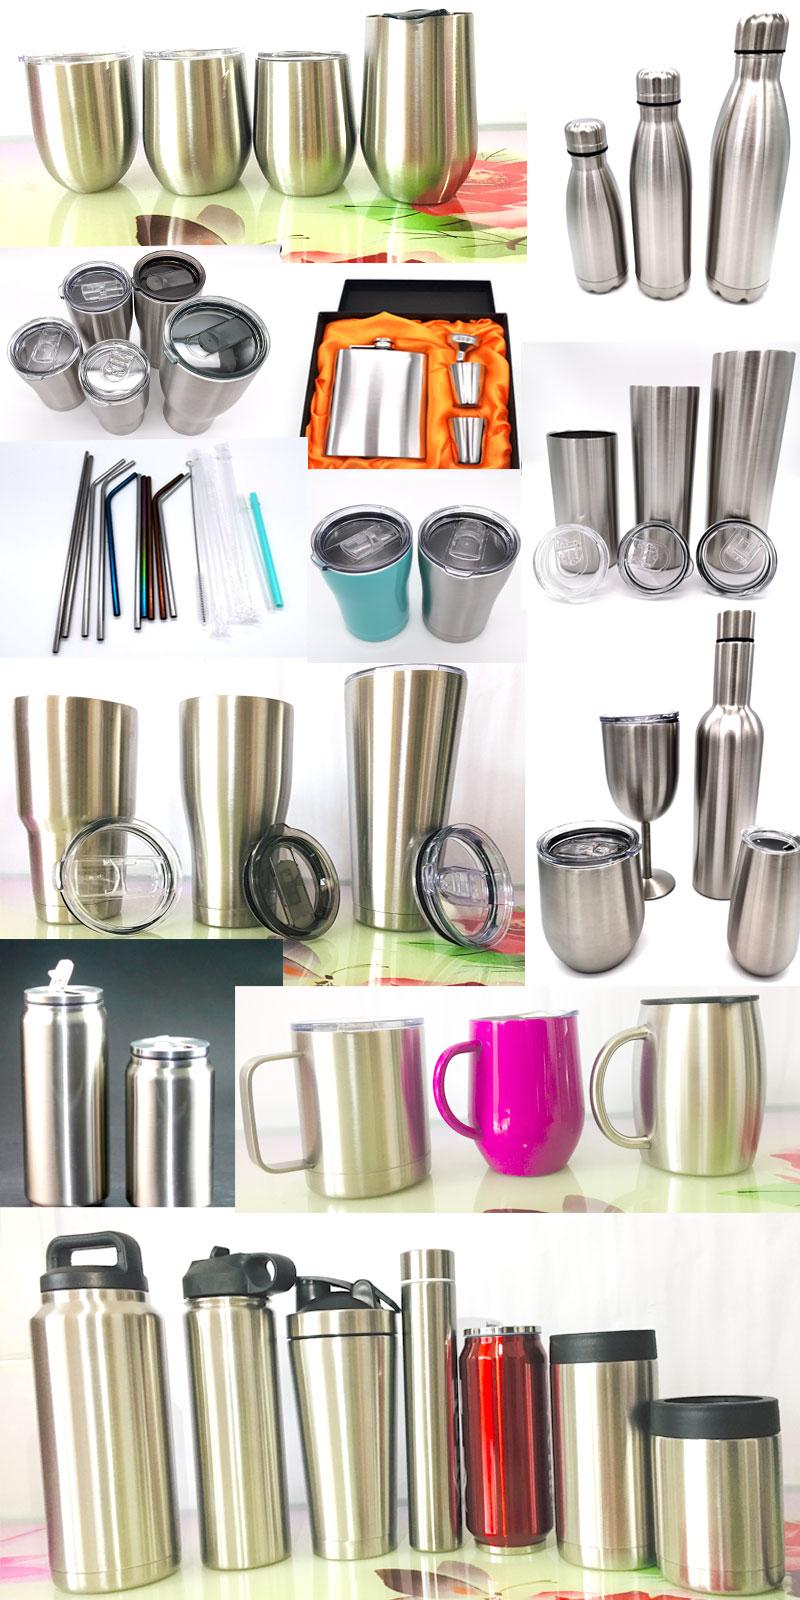 stainless steel egg shape coffee mug